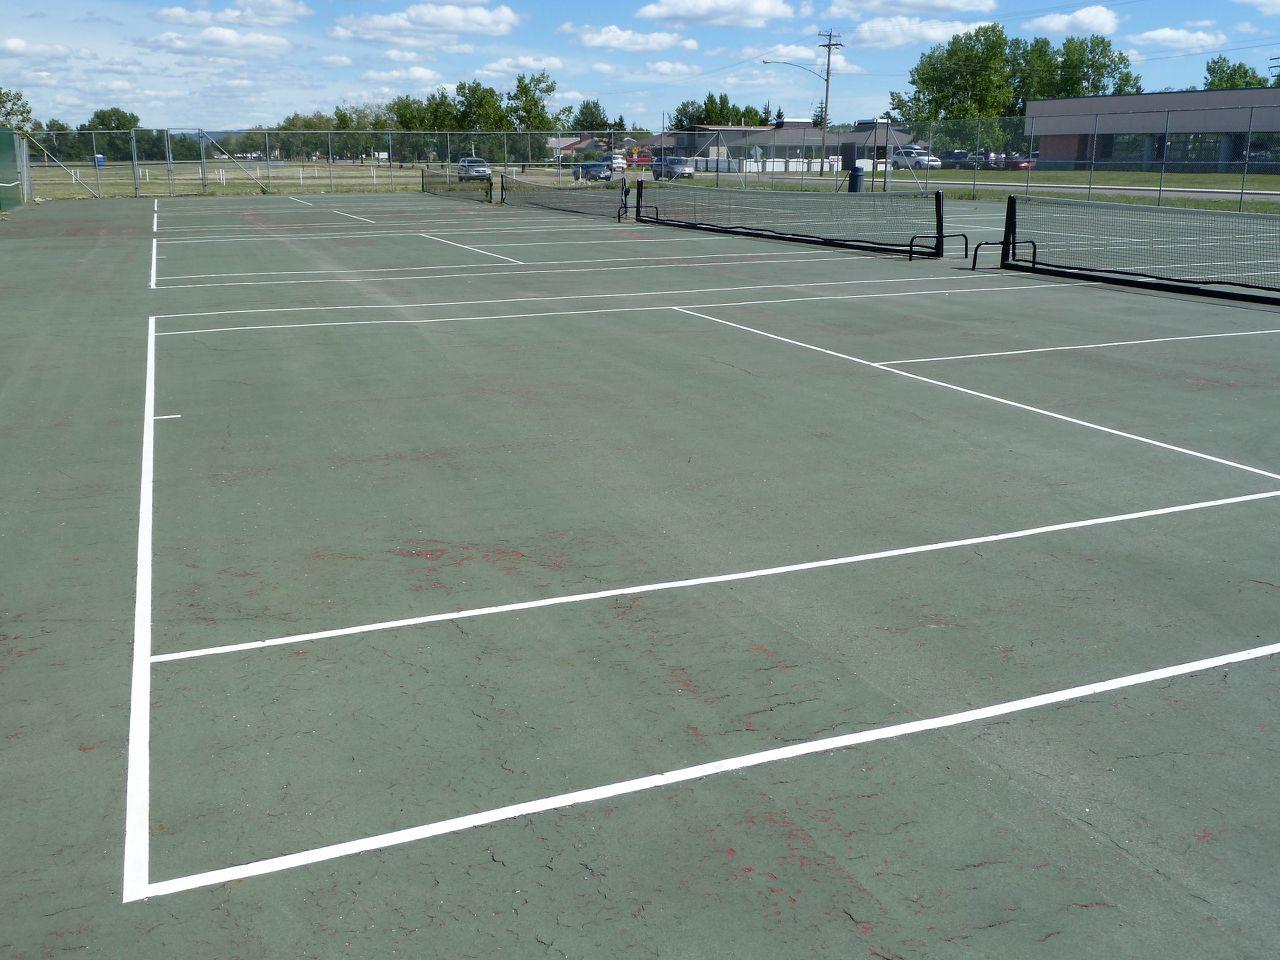 tennis-tourist-dawson-creek-bc-tennis-court-wide-shot-bill-adair